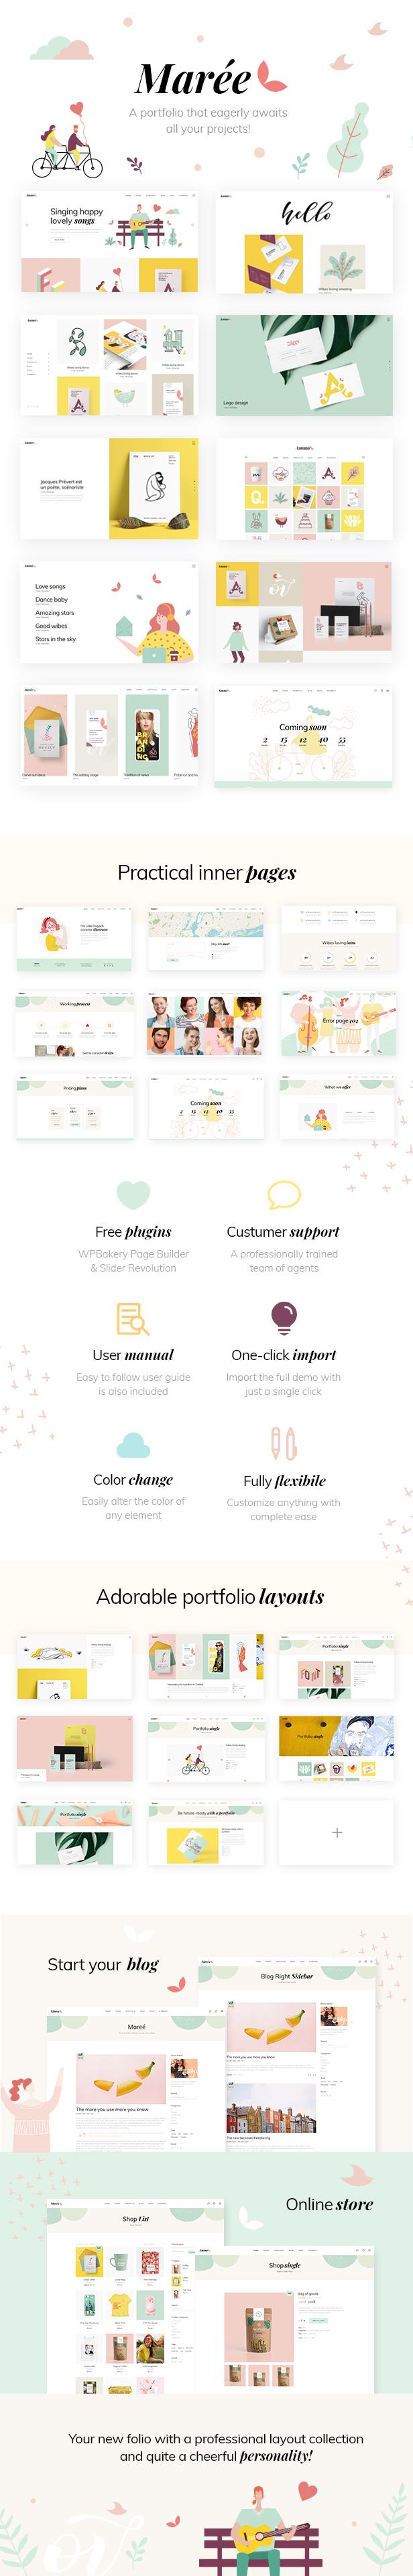 Marée - Illustration and Design Portfolio Theme - 1